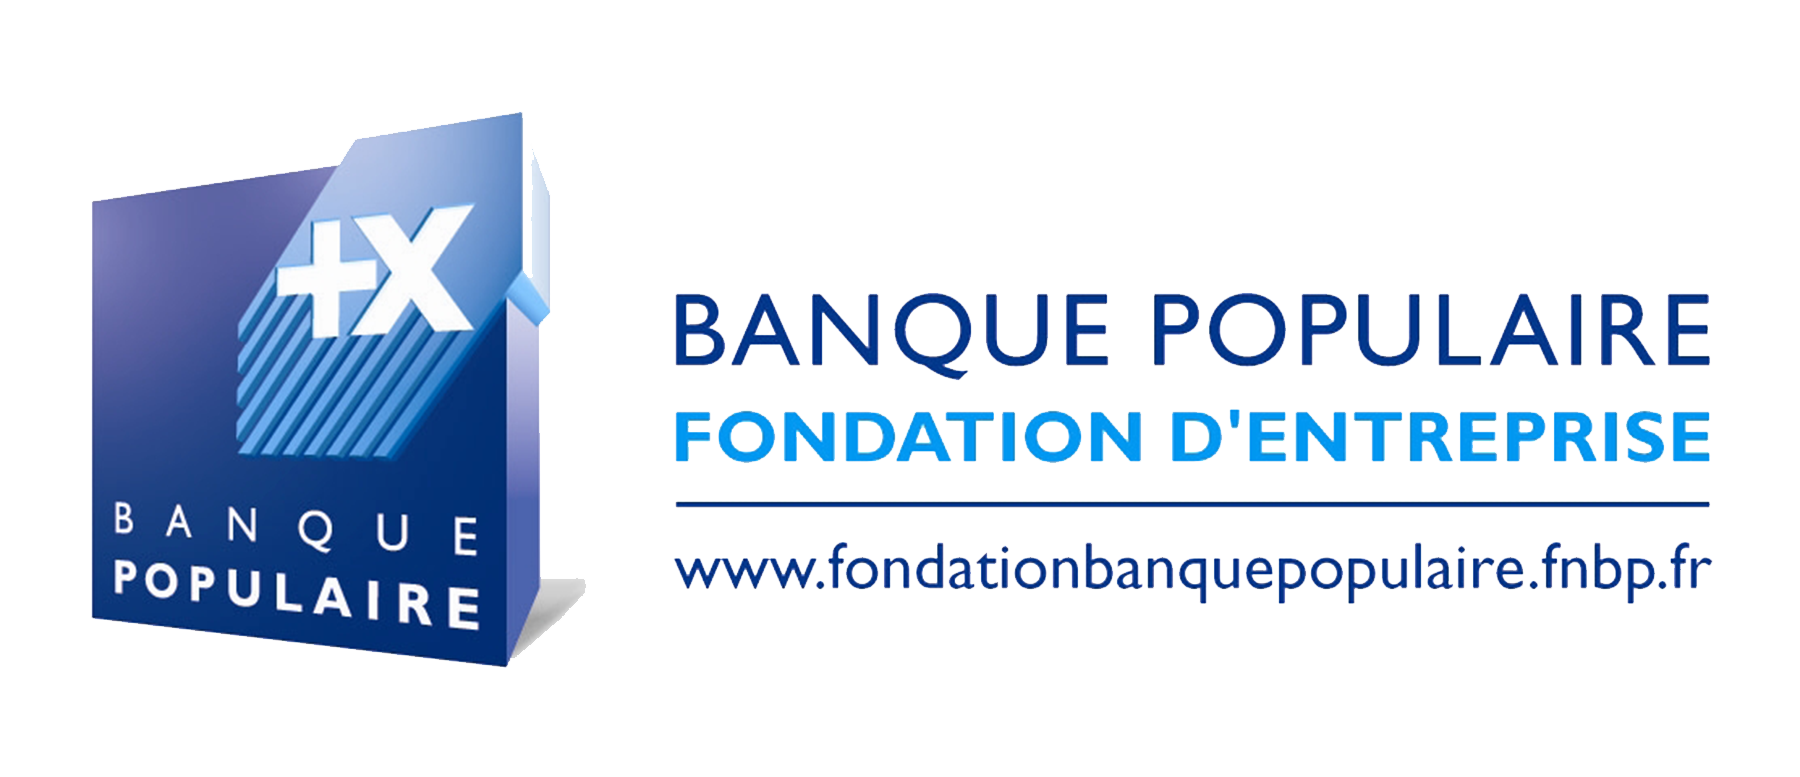 triozadig_banquepopulaire